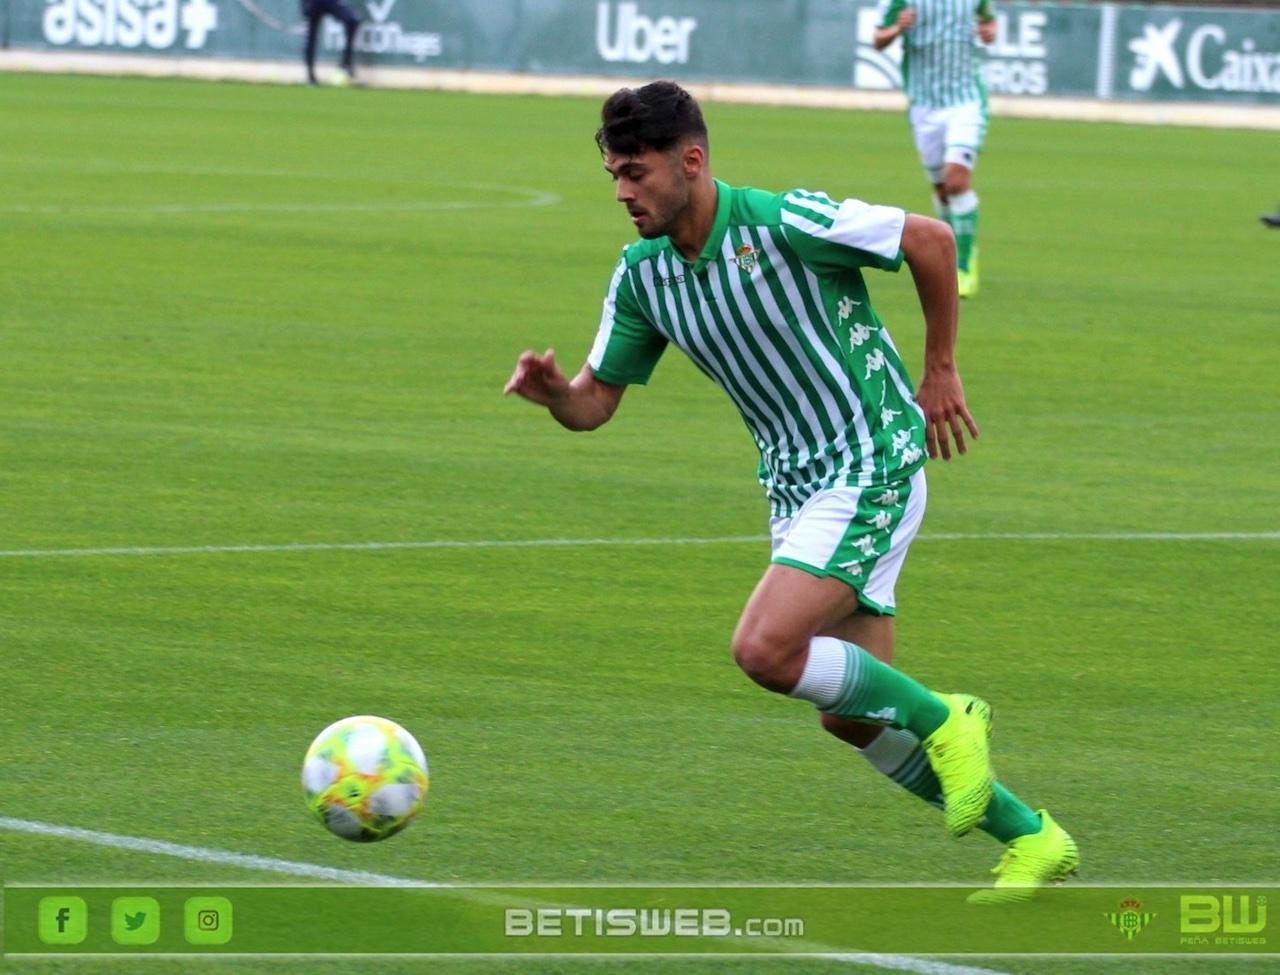 J18 - Betis Deportivo - Gerena 63